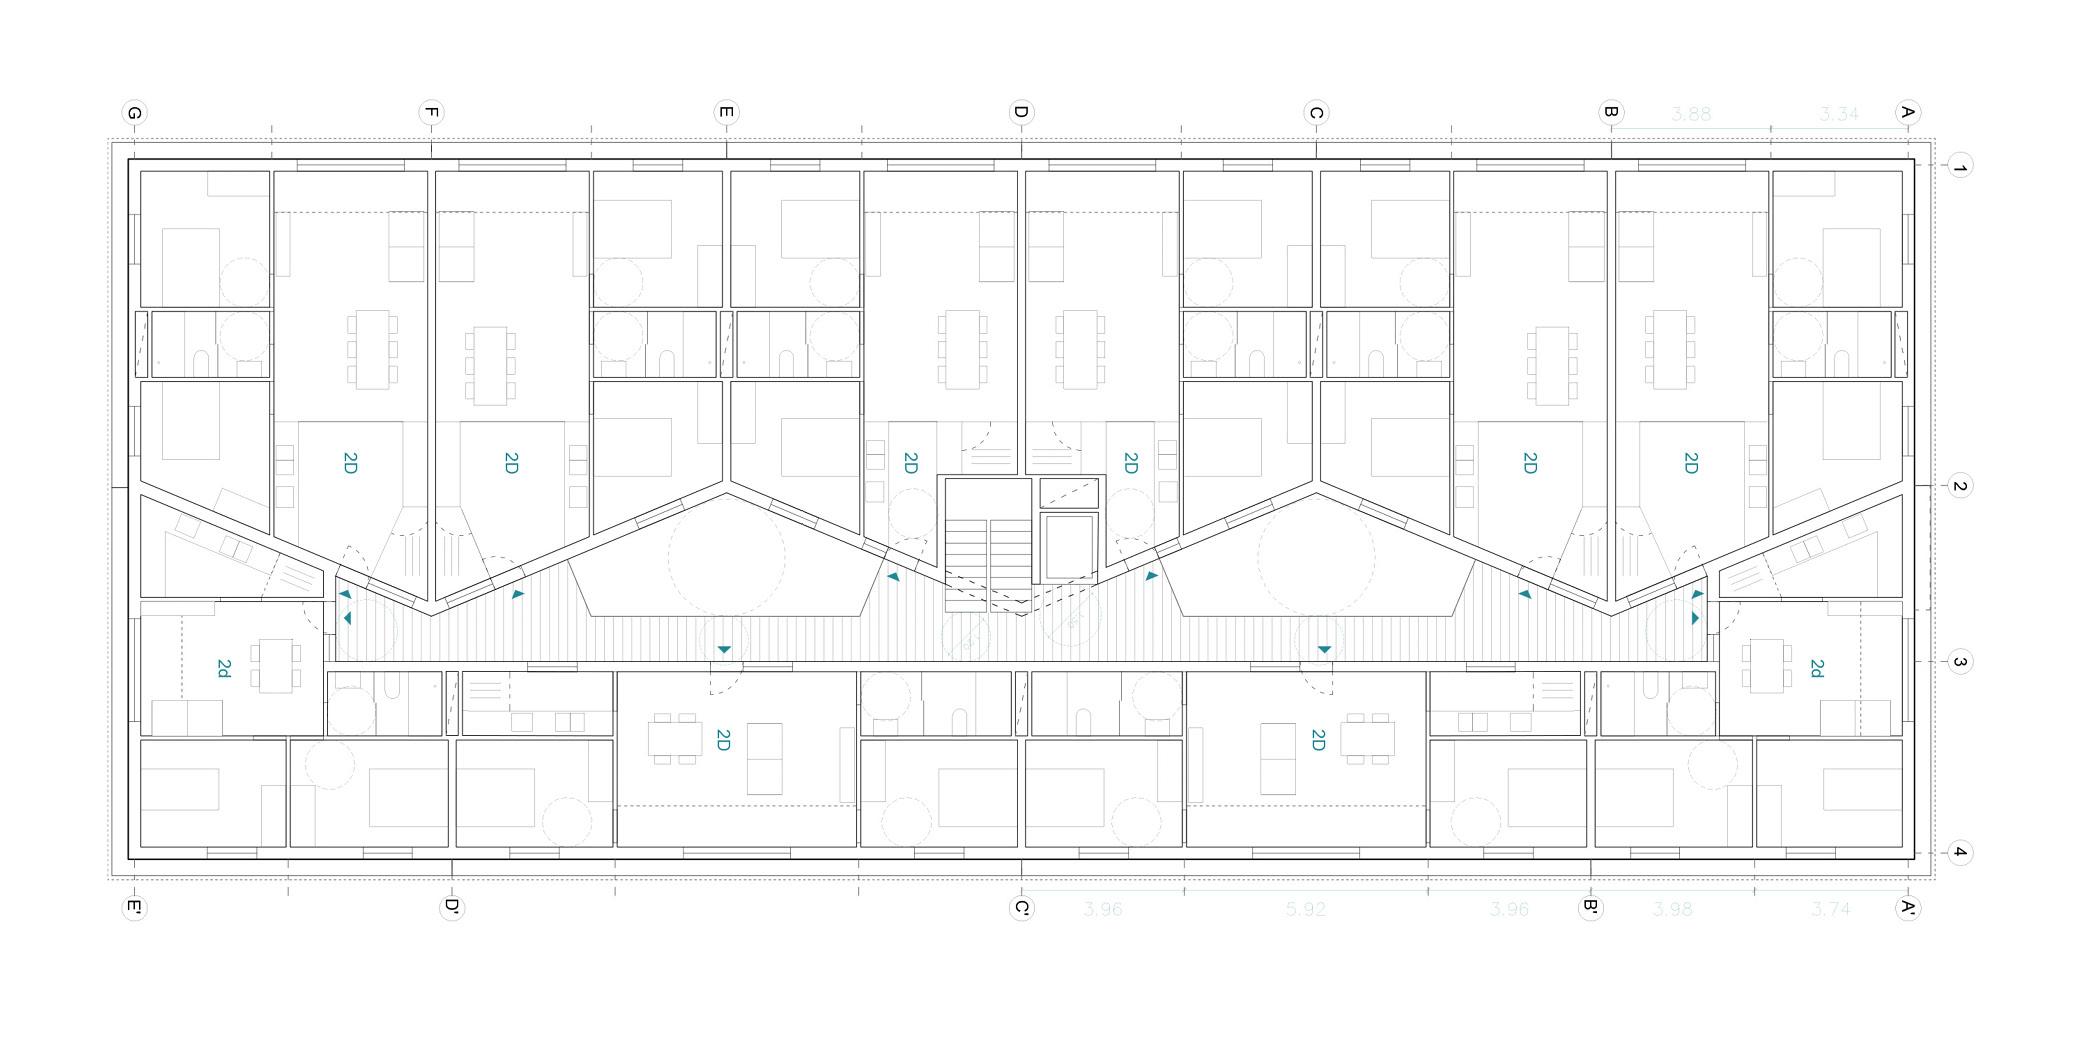 Terrasa housing OCA ARCHITEctS OCA ARQUITECTOS architecture design Hernan Lleida Bernardo Garcia3